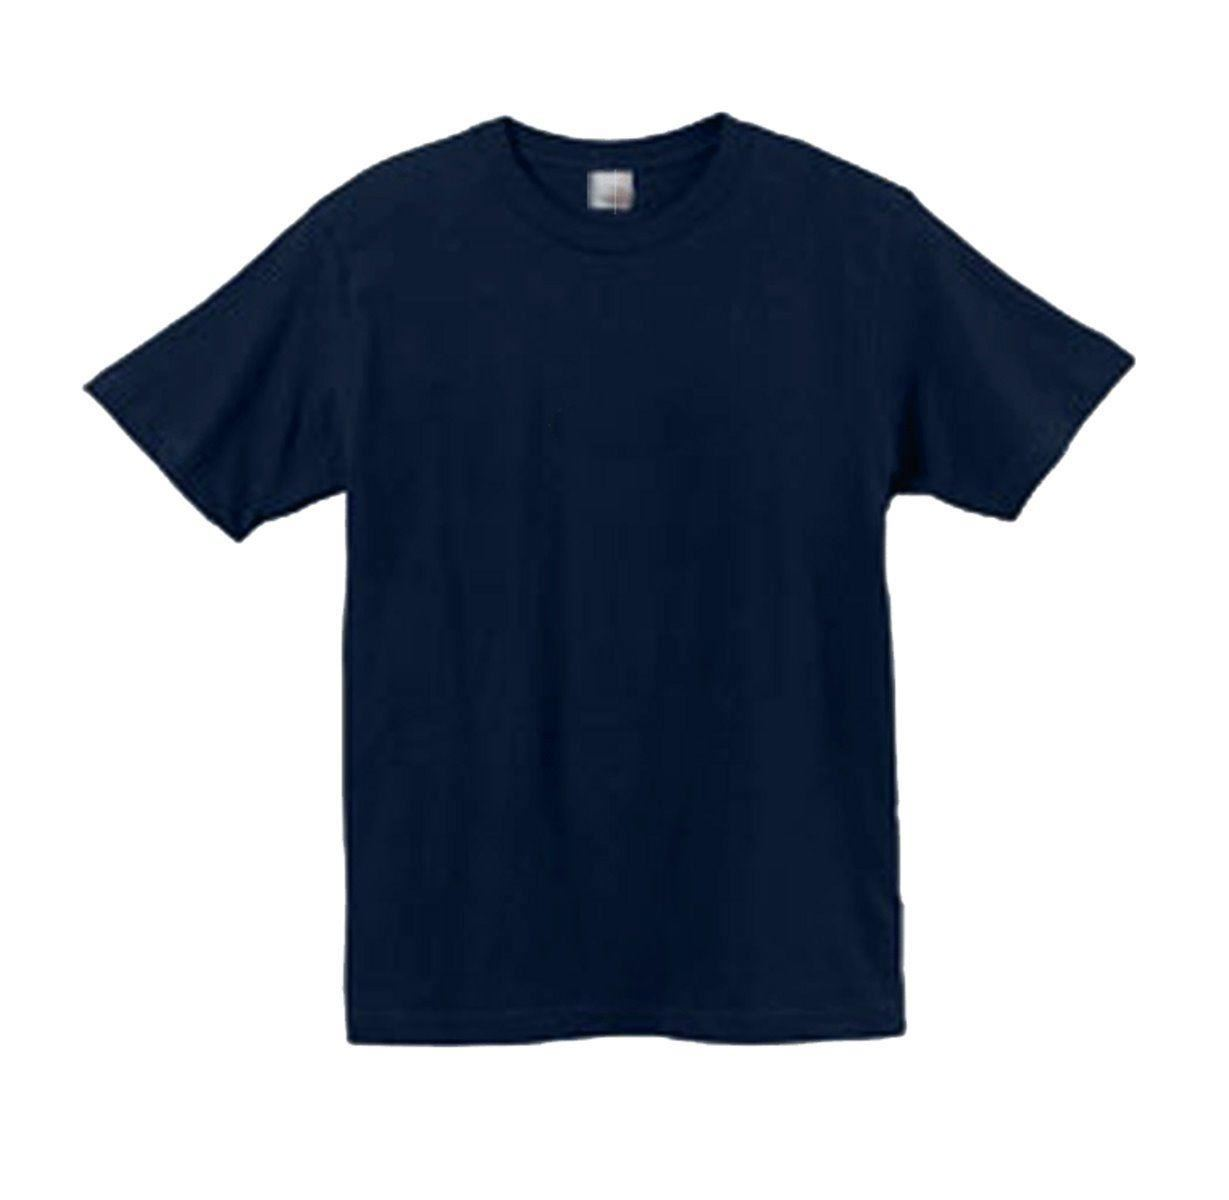 Big Mens King Size T Shirt T Shirt Tee Navy Cotton 2xl 3xl